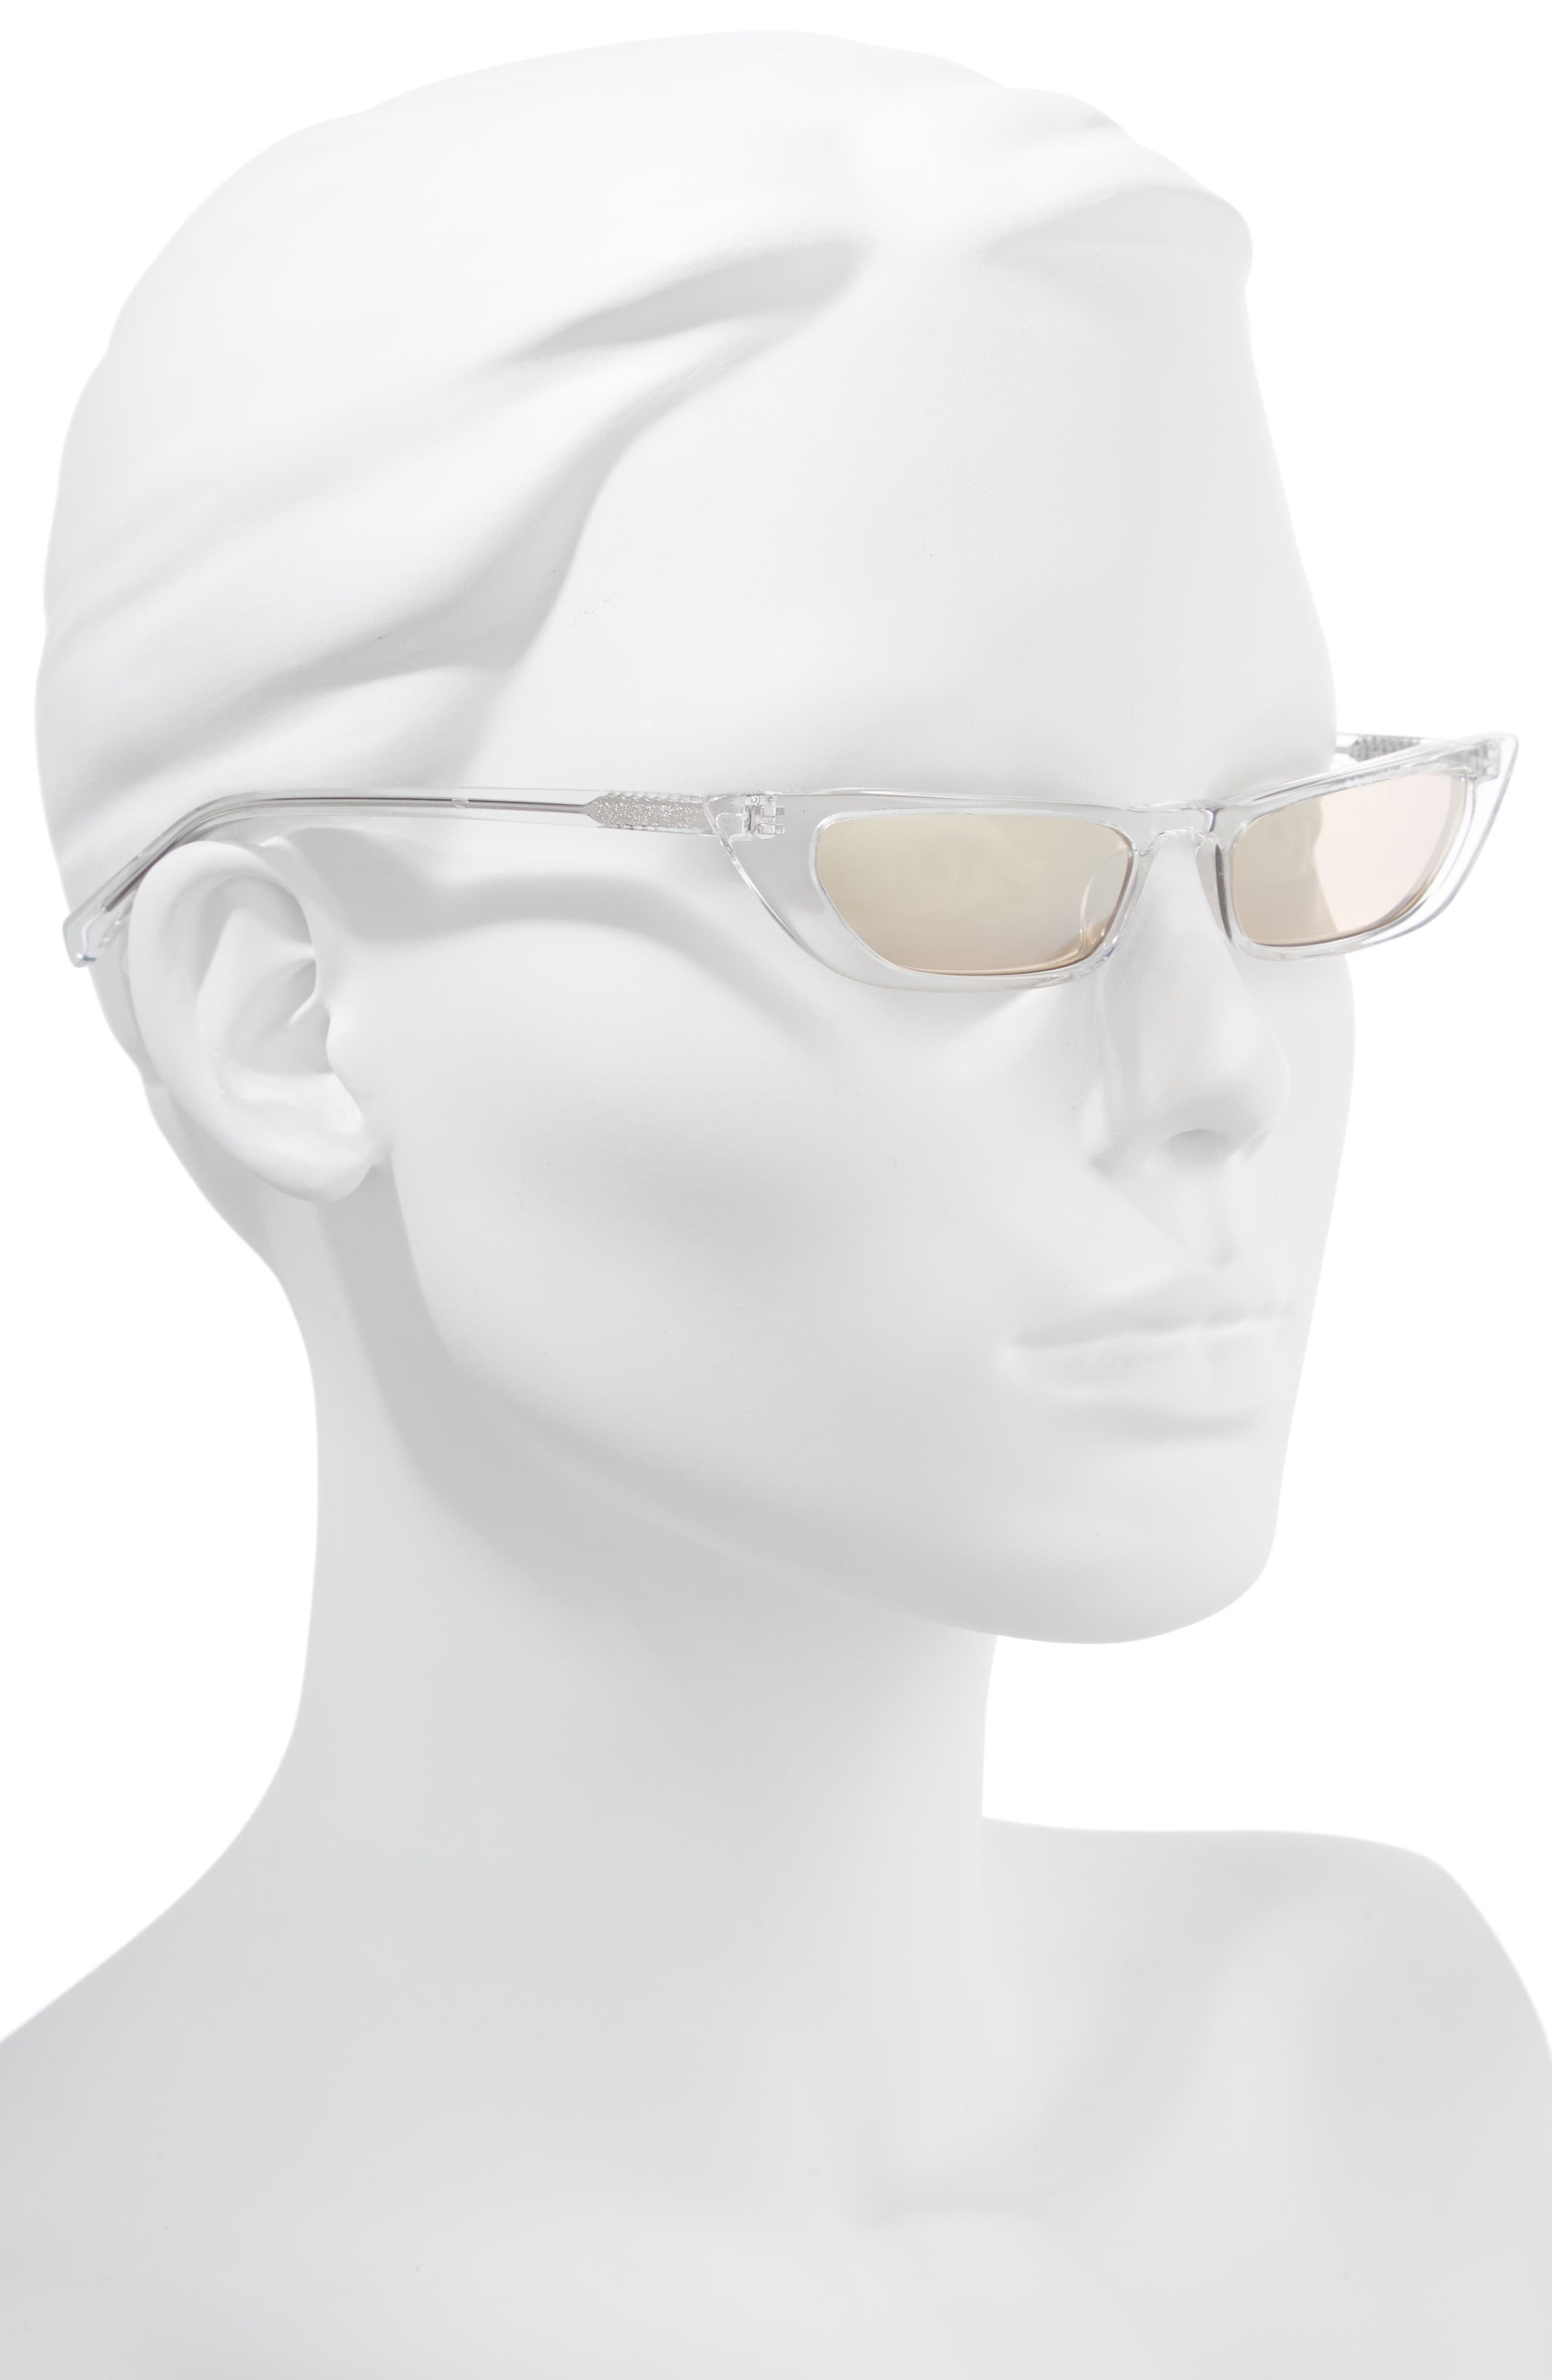 KENDALL + KYLIE,                             Vivian Extreme 51mm Cat Eye Sunglasses,                             Alternate thumbnail 2, color,                             106